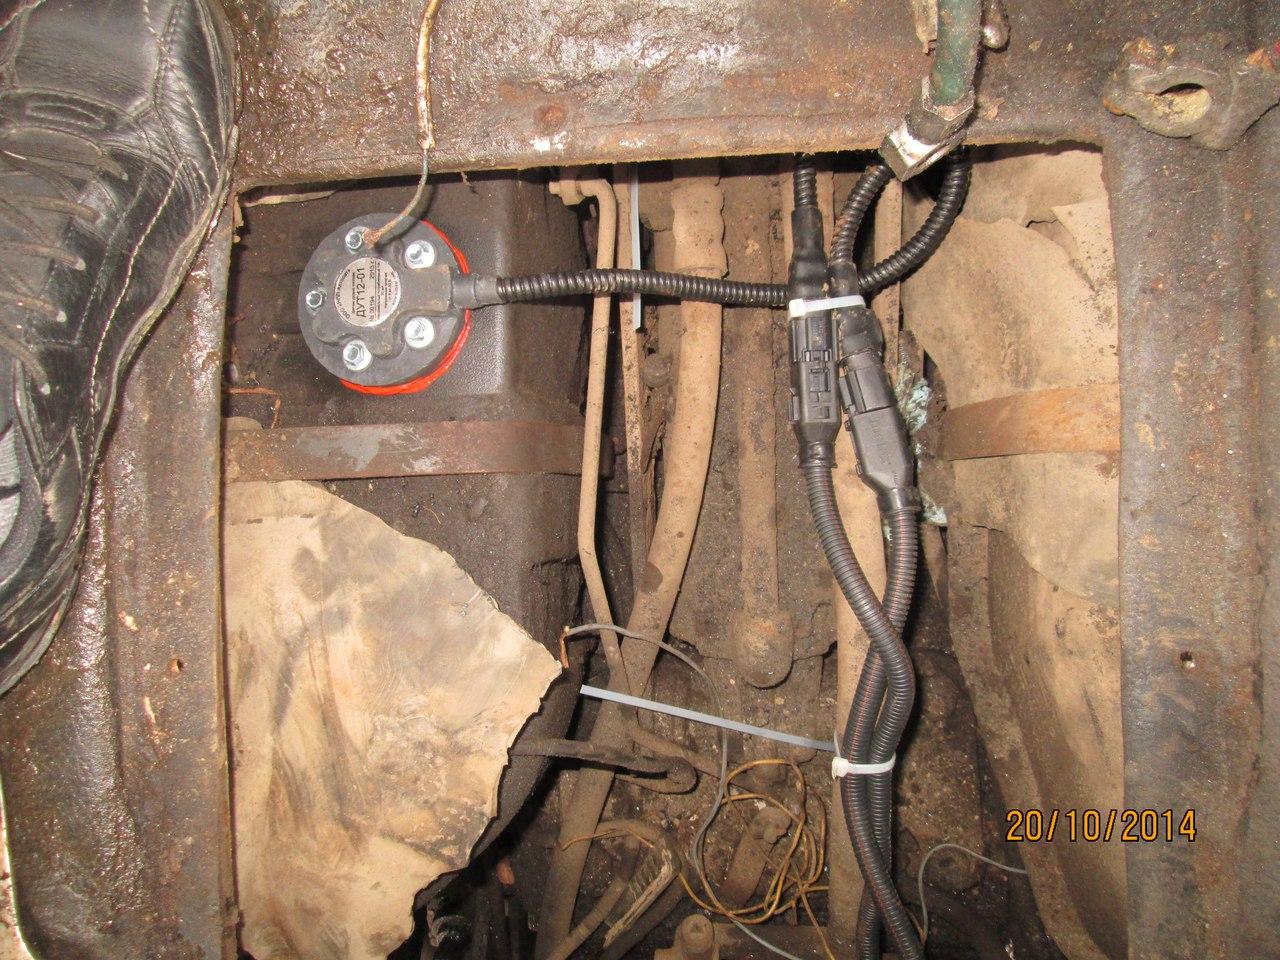 МТЗ Датчик уровня топлива (L=226 мм) МТЗ-80-892 (пр-во ОАО.